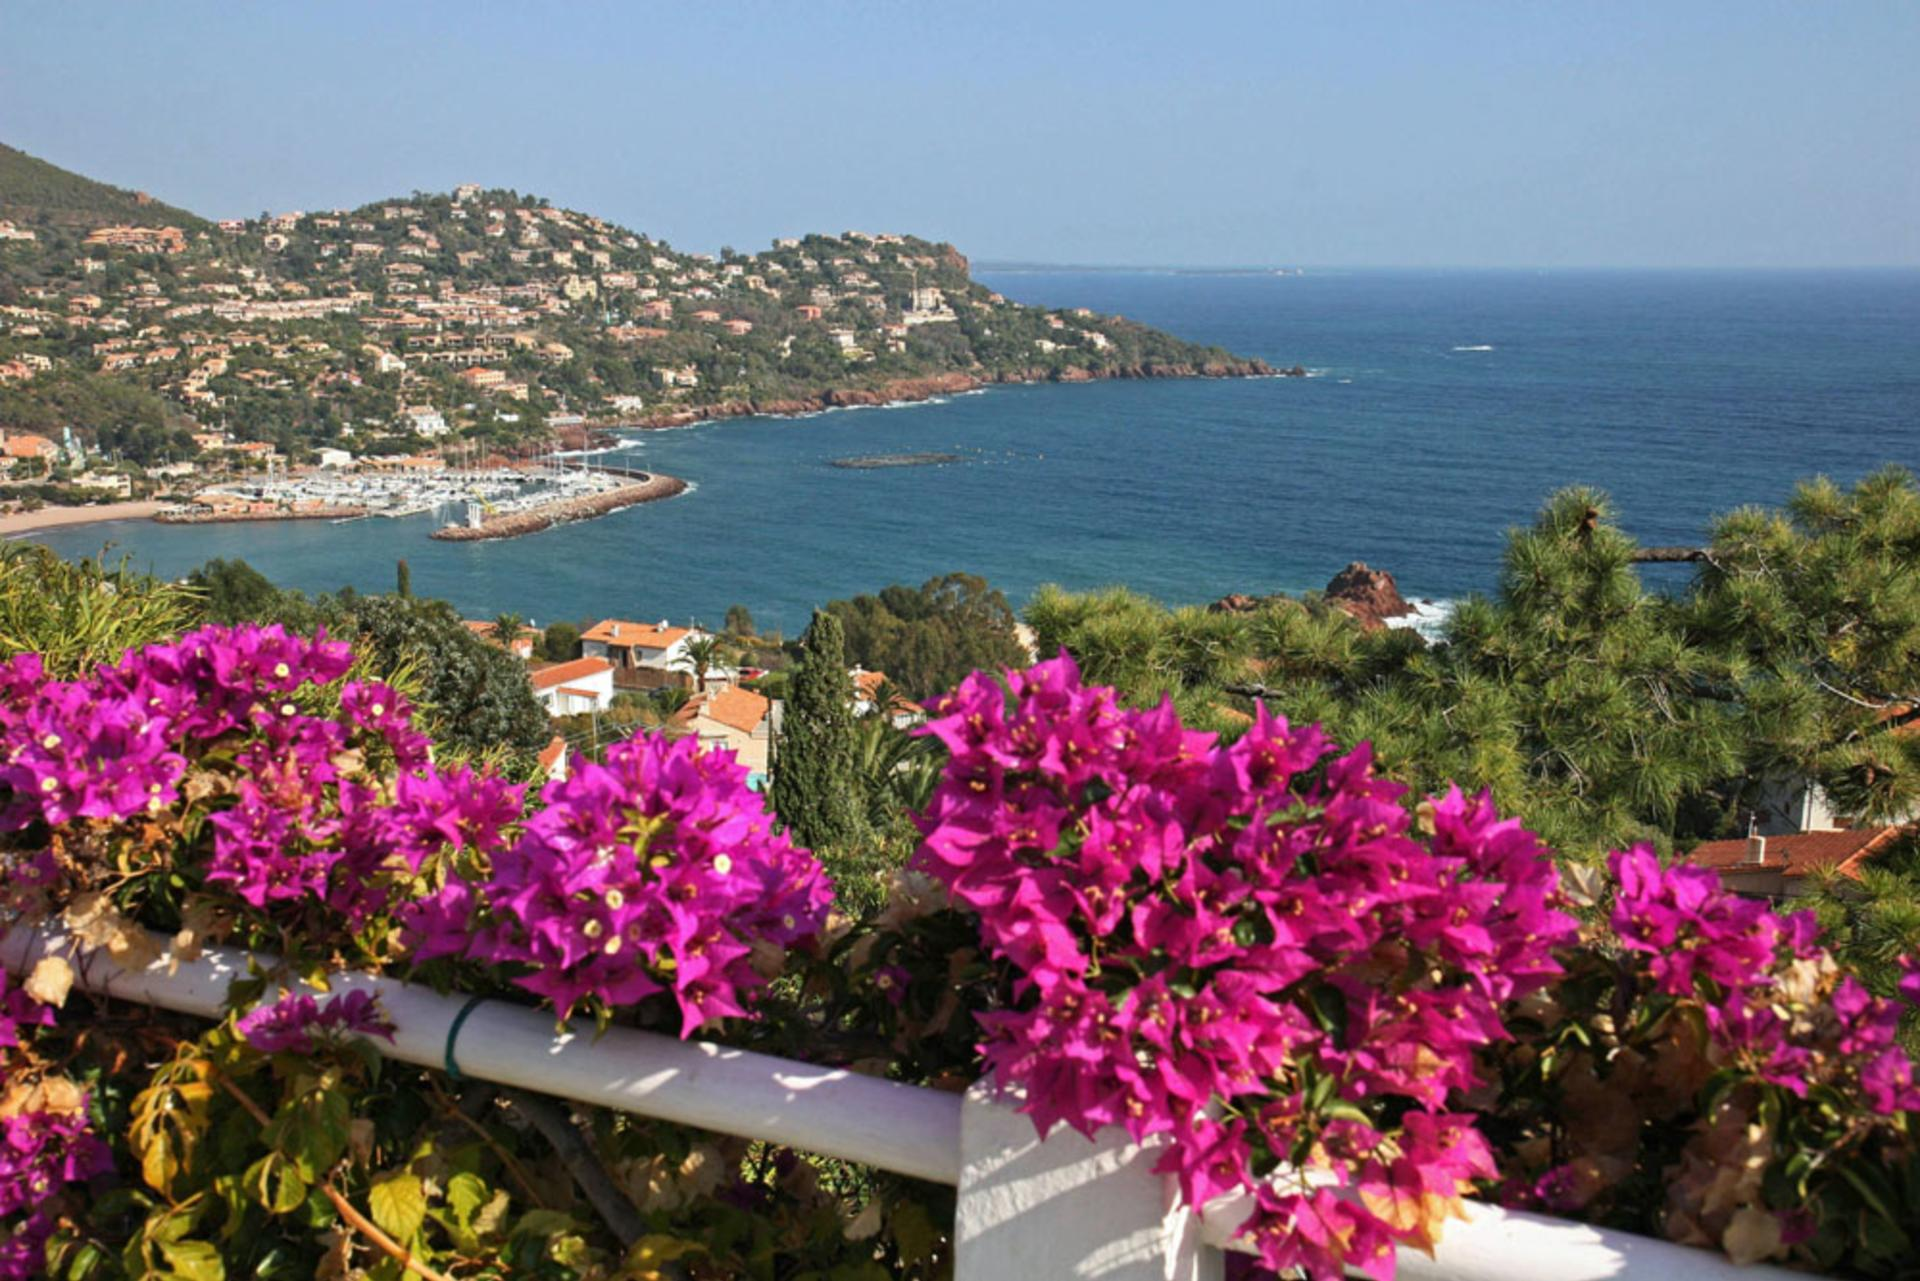 Villa Sea Views, L'Oursin, Le Trayas, Cote d'Azur.